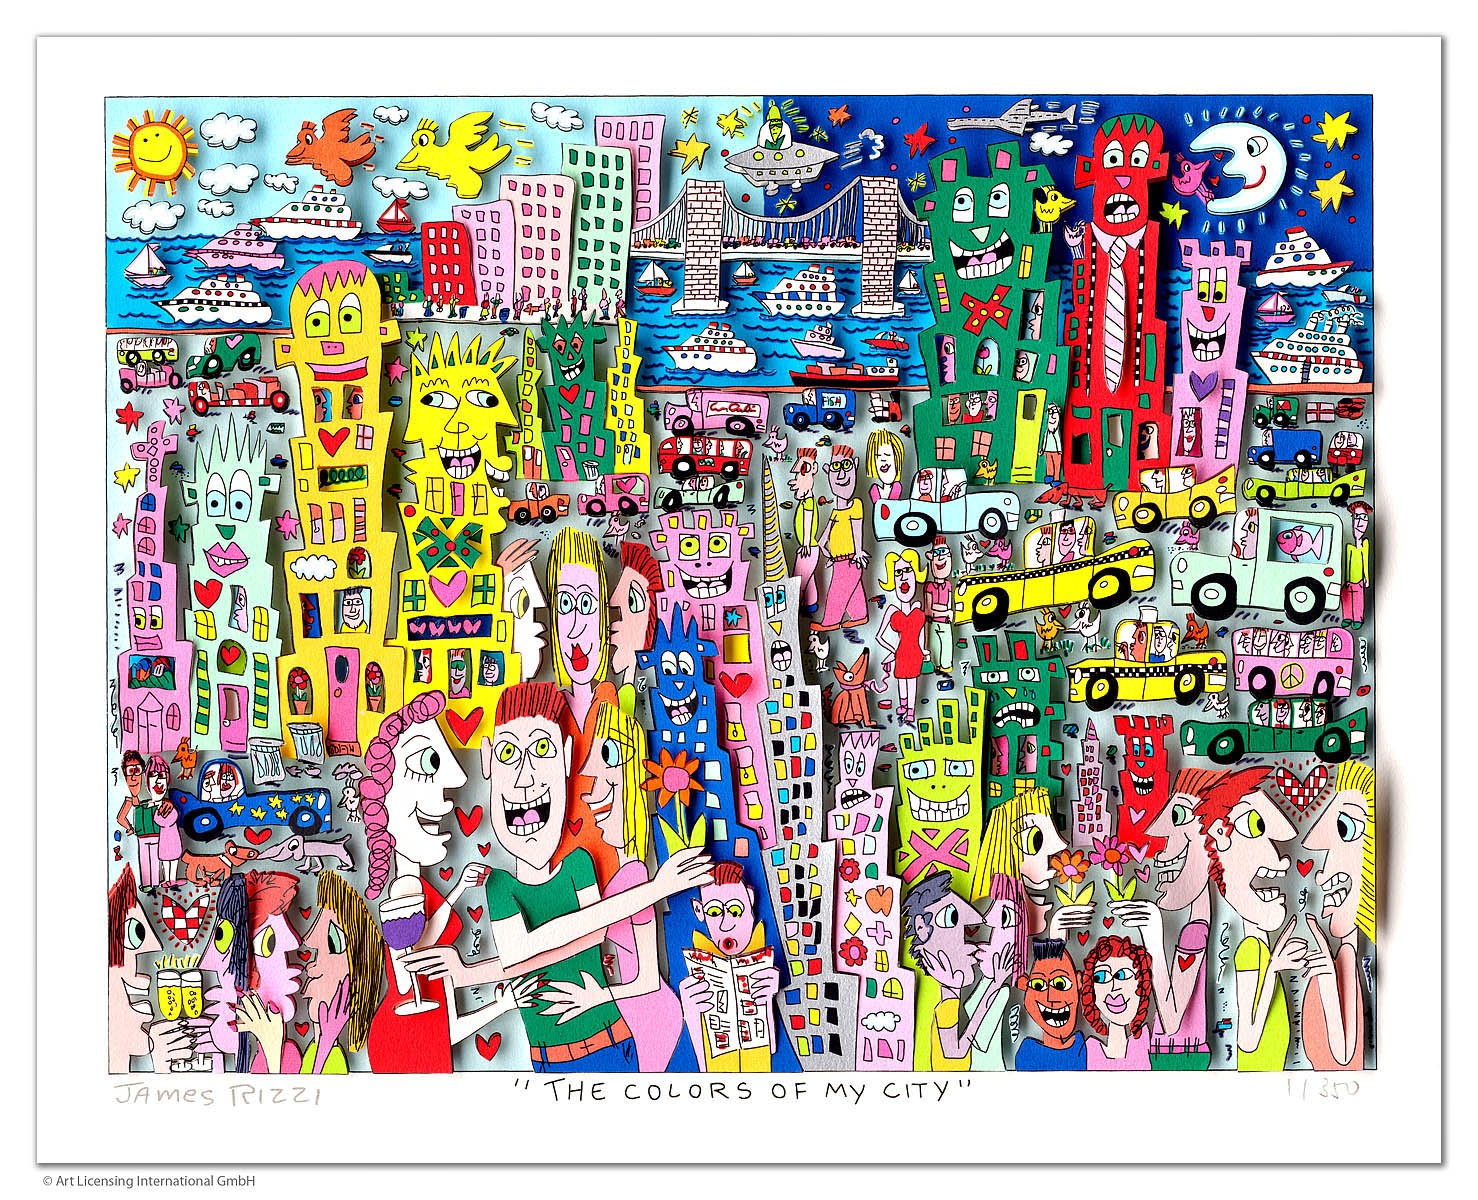 James Rizzi - THE COLOURS OF MY CITY - Original 3D Bild drucksigniert - ohne Rahmen PP-Normale Nummer